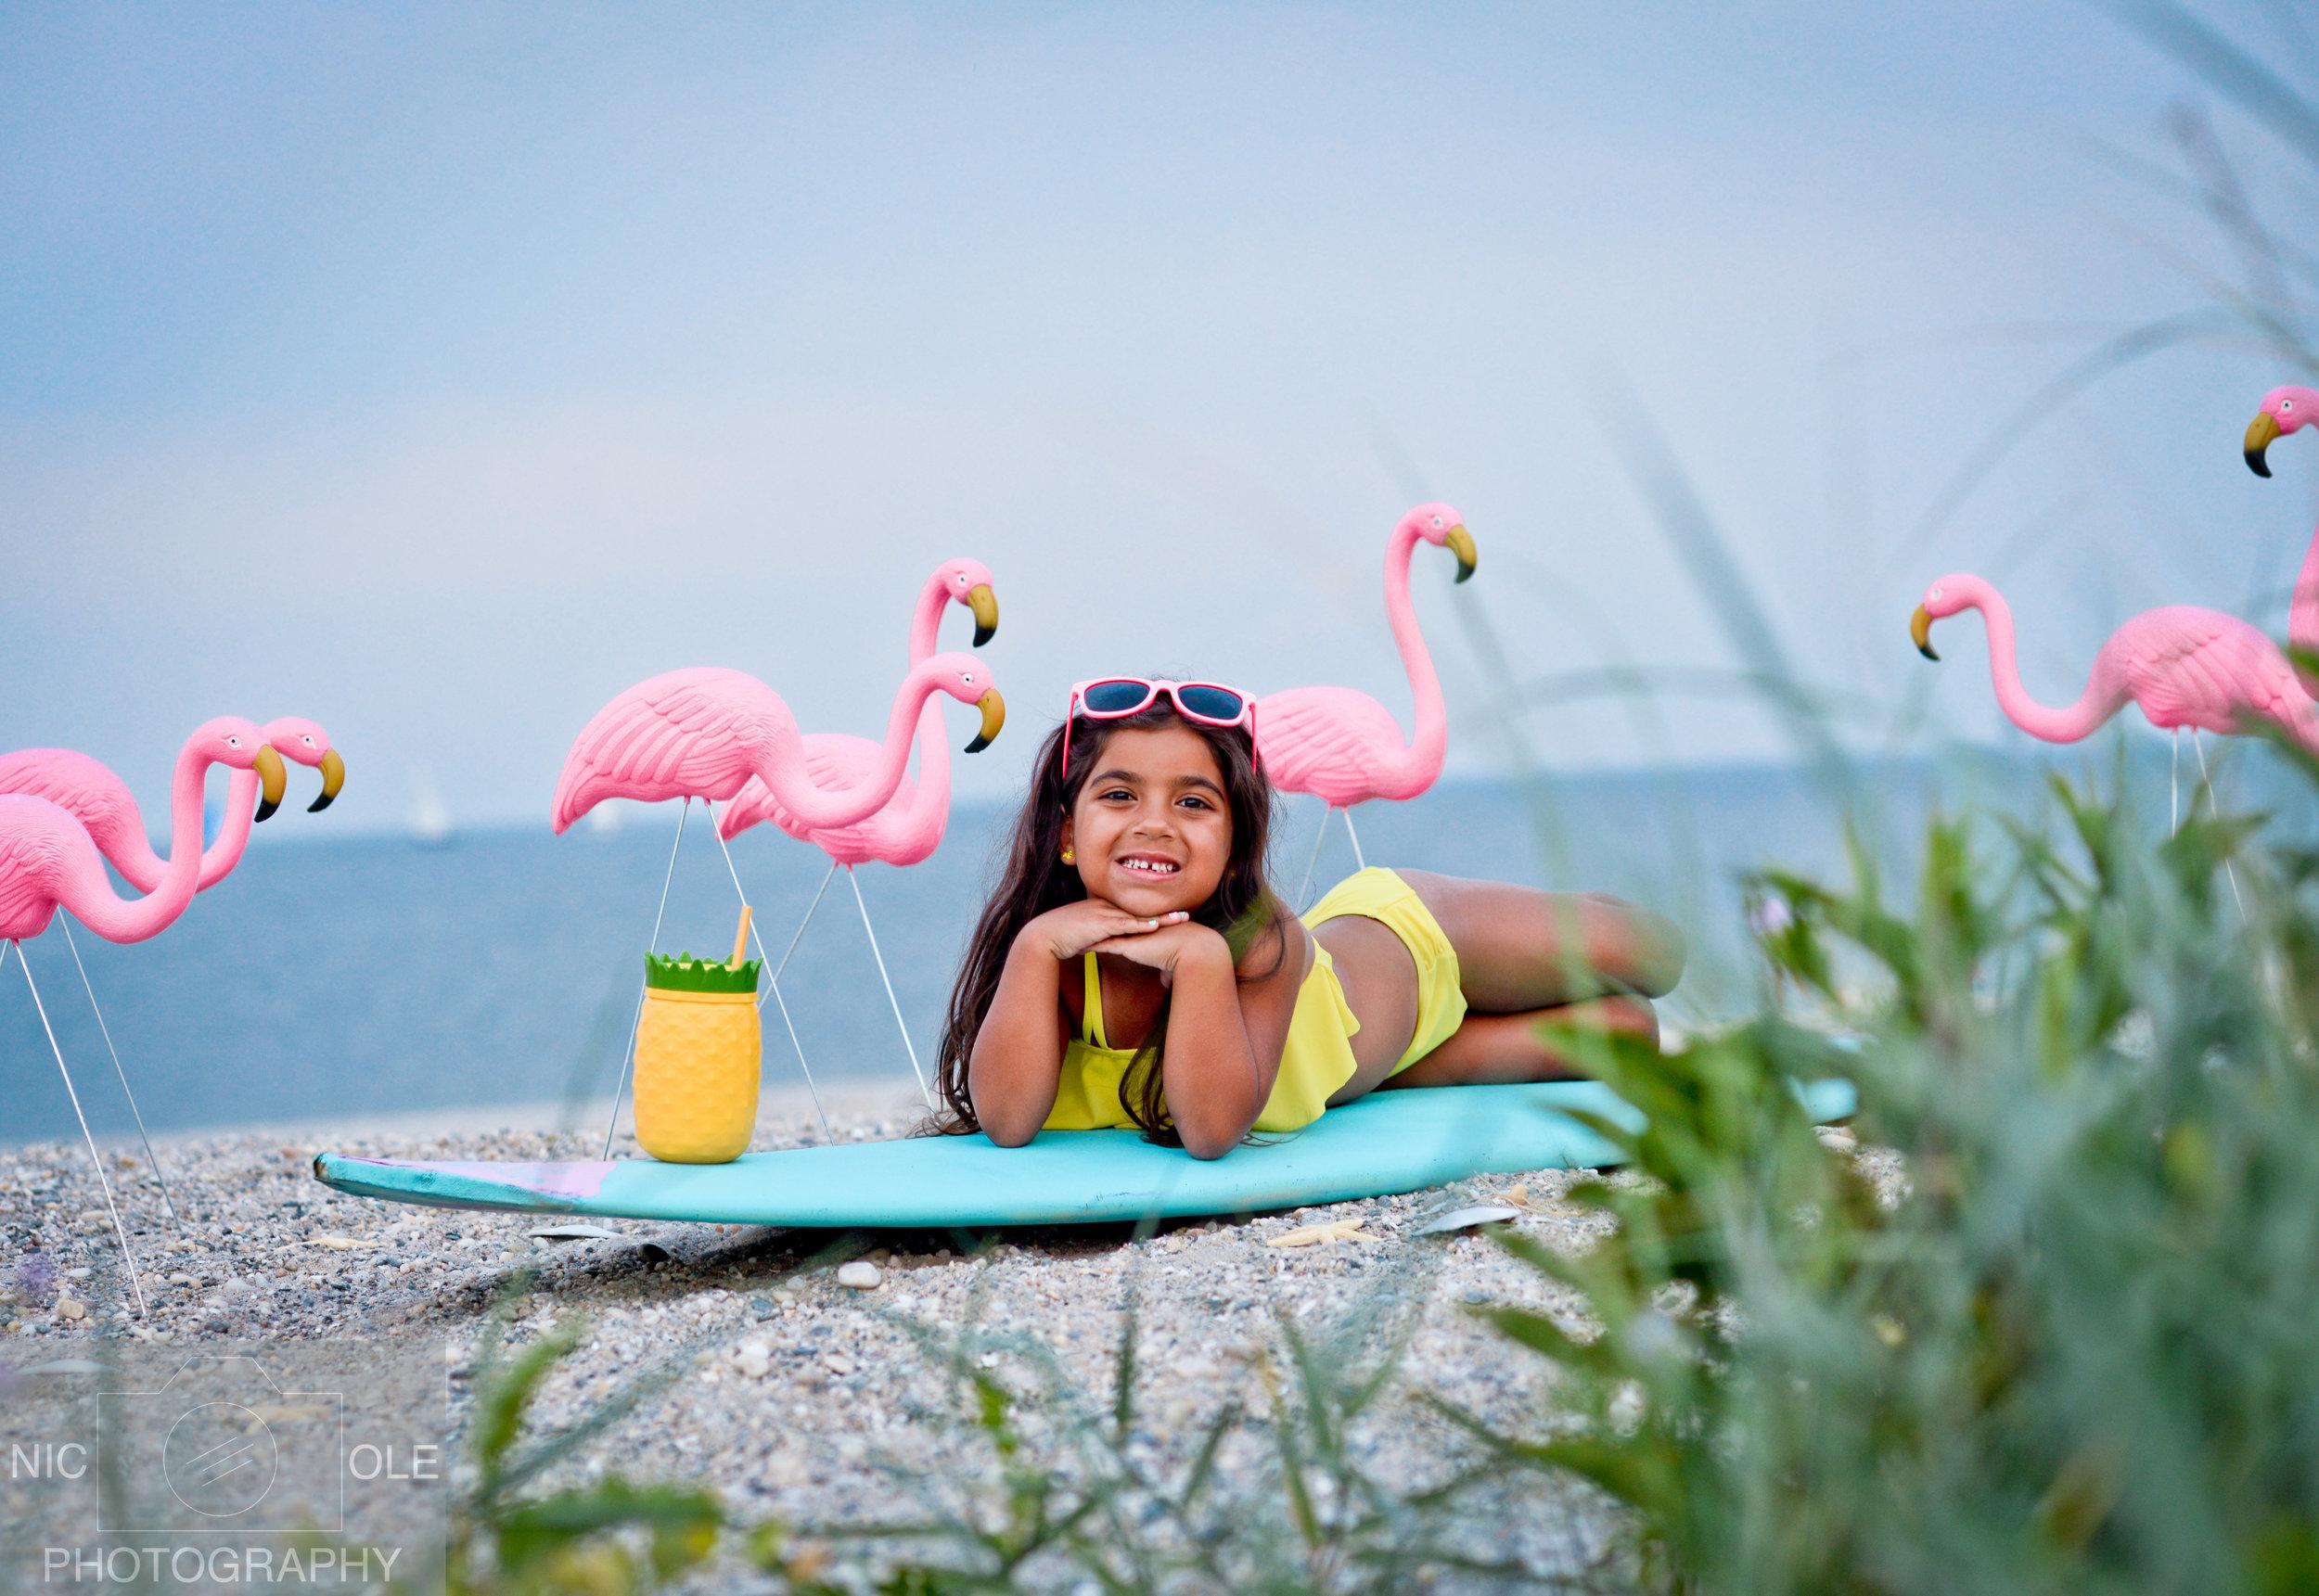 Cielo Noemi Flamingo Beach 7.20.17- NIC-OLE Photography-5.jpg